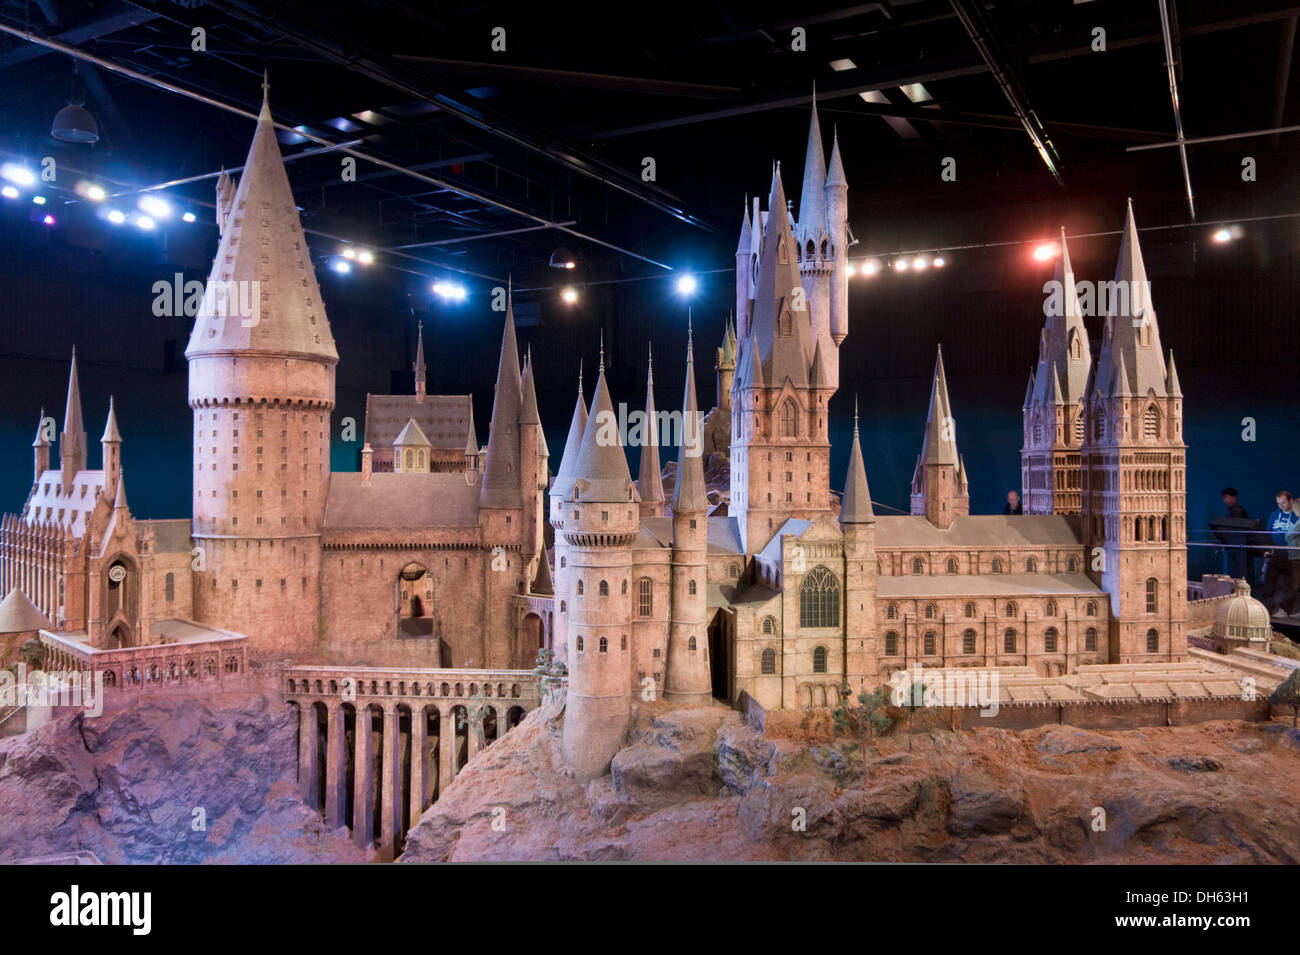 Interior scenes of Hogwarts castle Model room Harry Potter World Warner Bros Studio Tour Leavesden Watford London - Stock Image